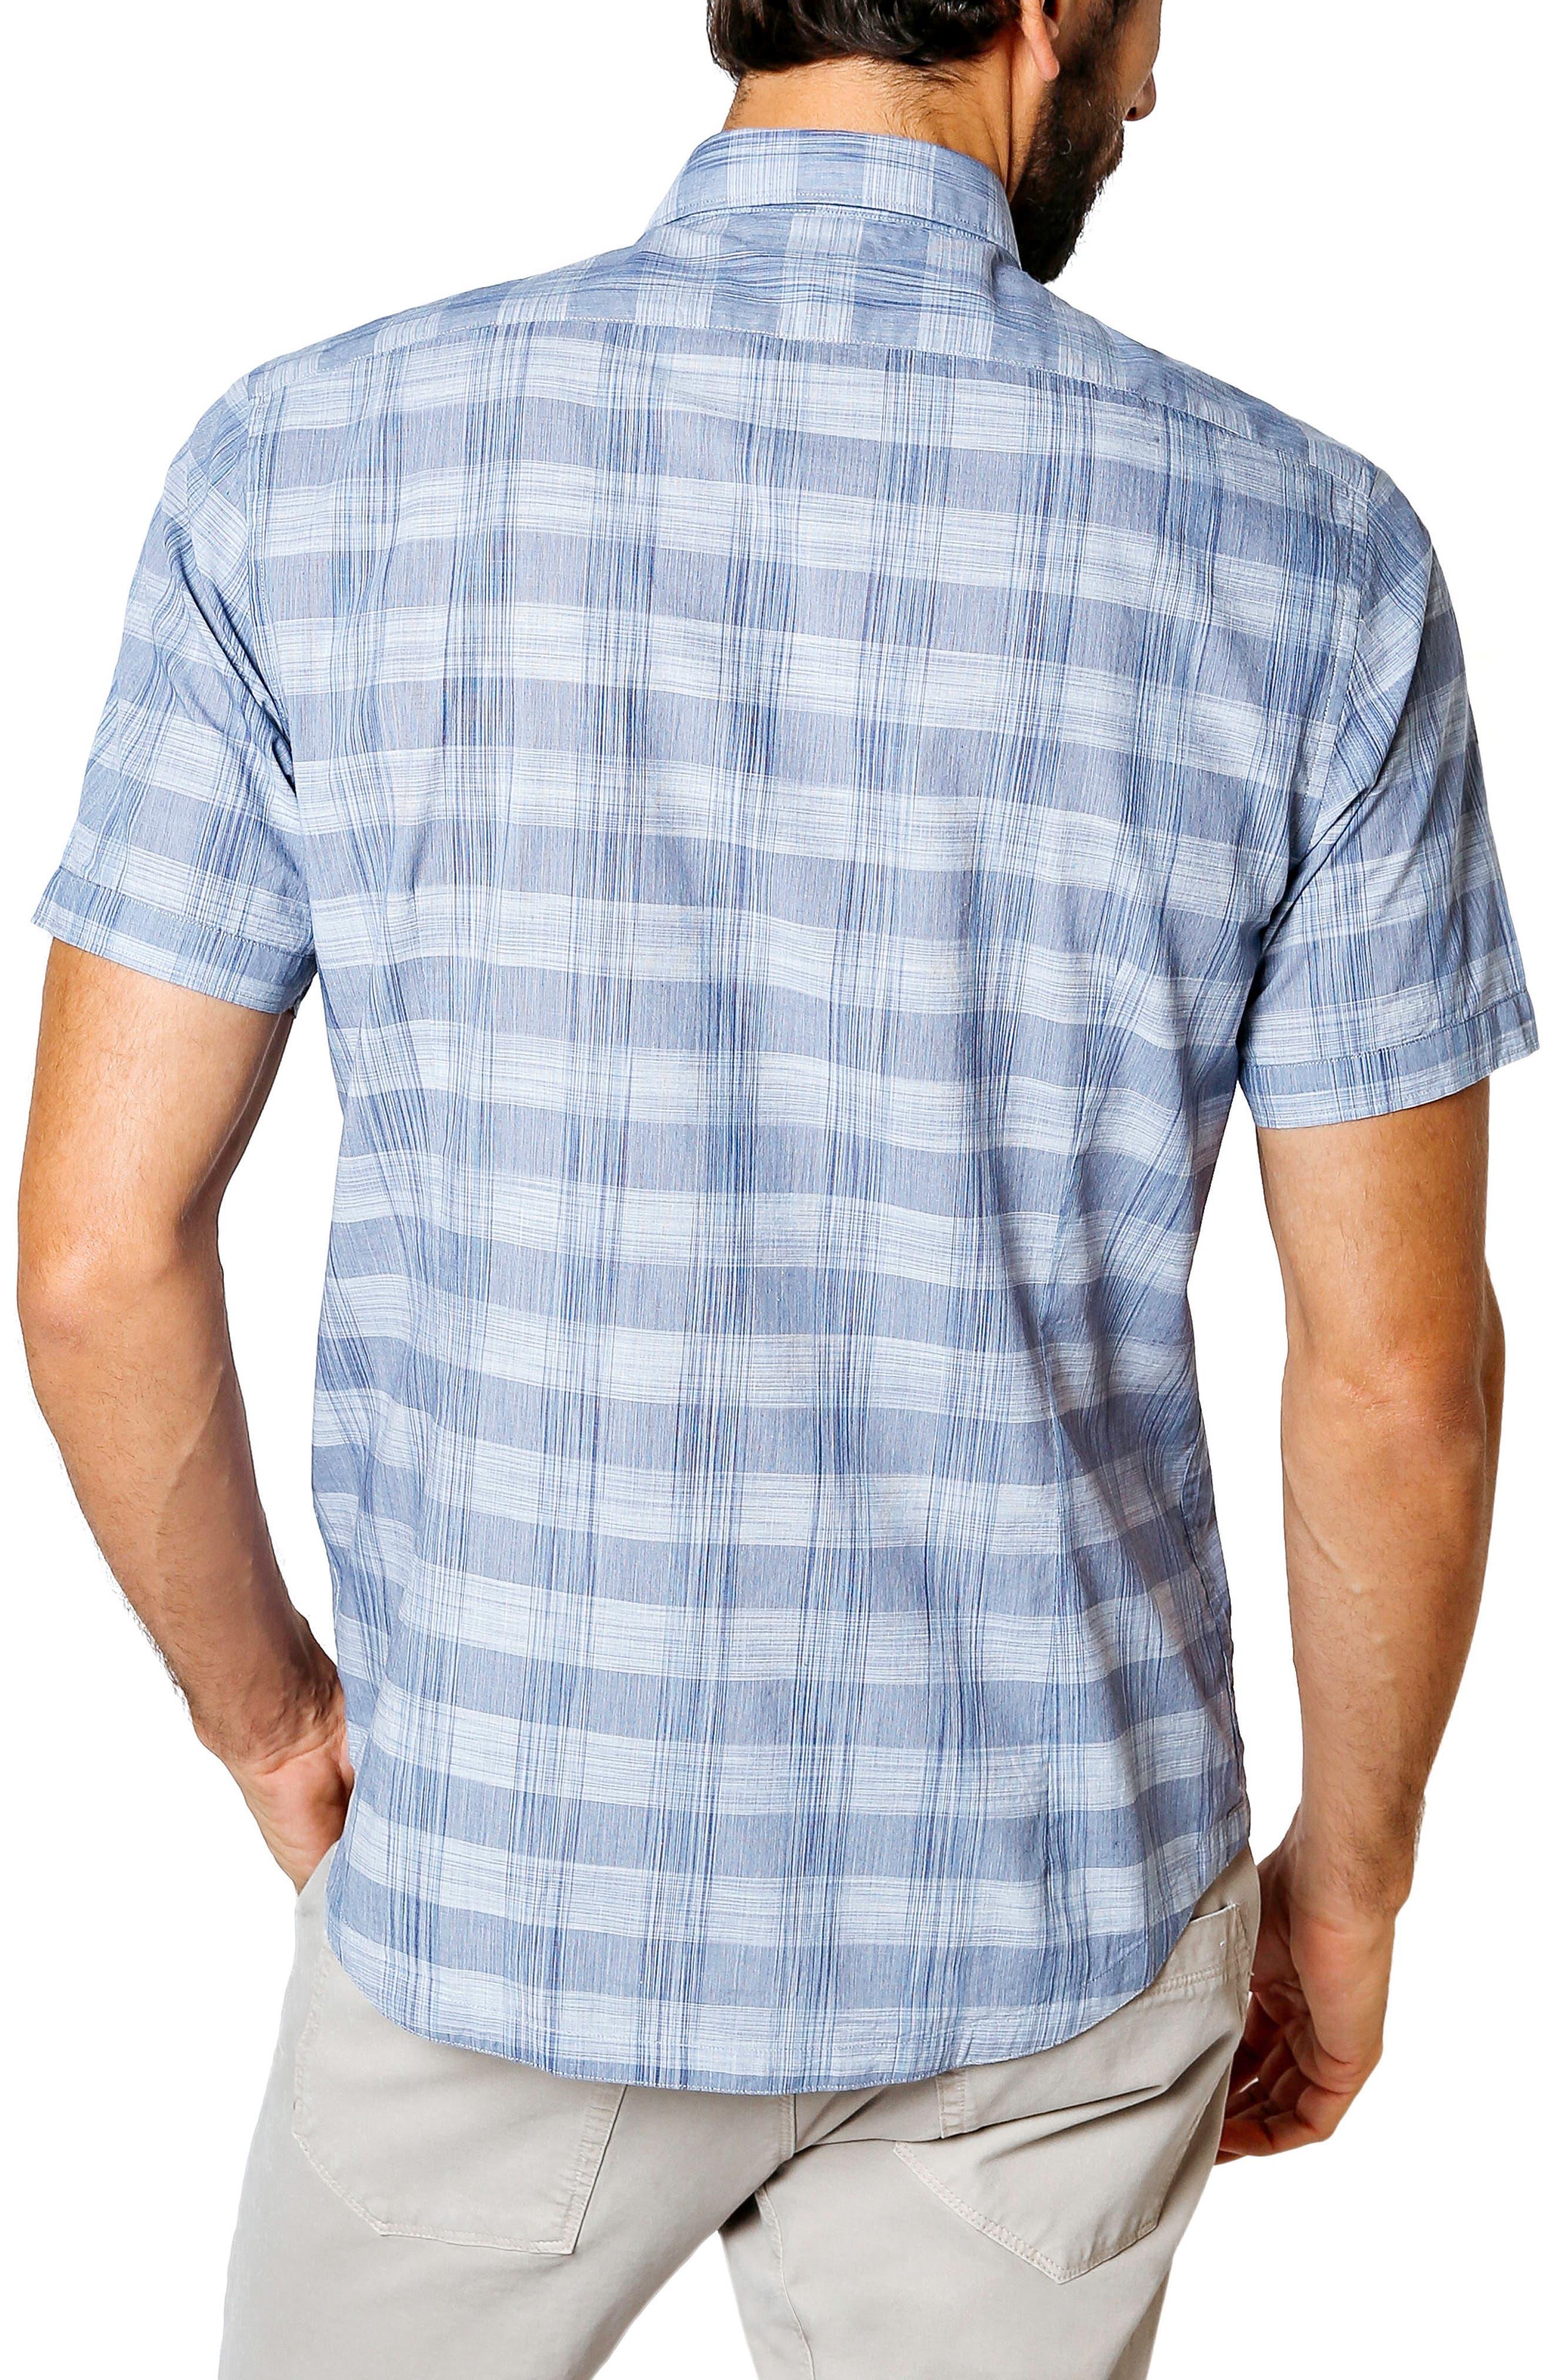 GOOD MAN BRAND,                             Palisade Space Trim Fit Check Sport Shirt,                             Alternate thumbnail 2, color,                             410